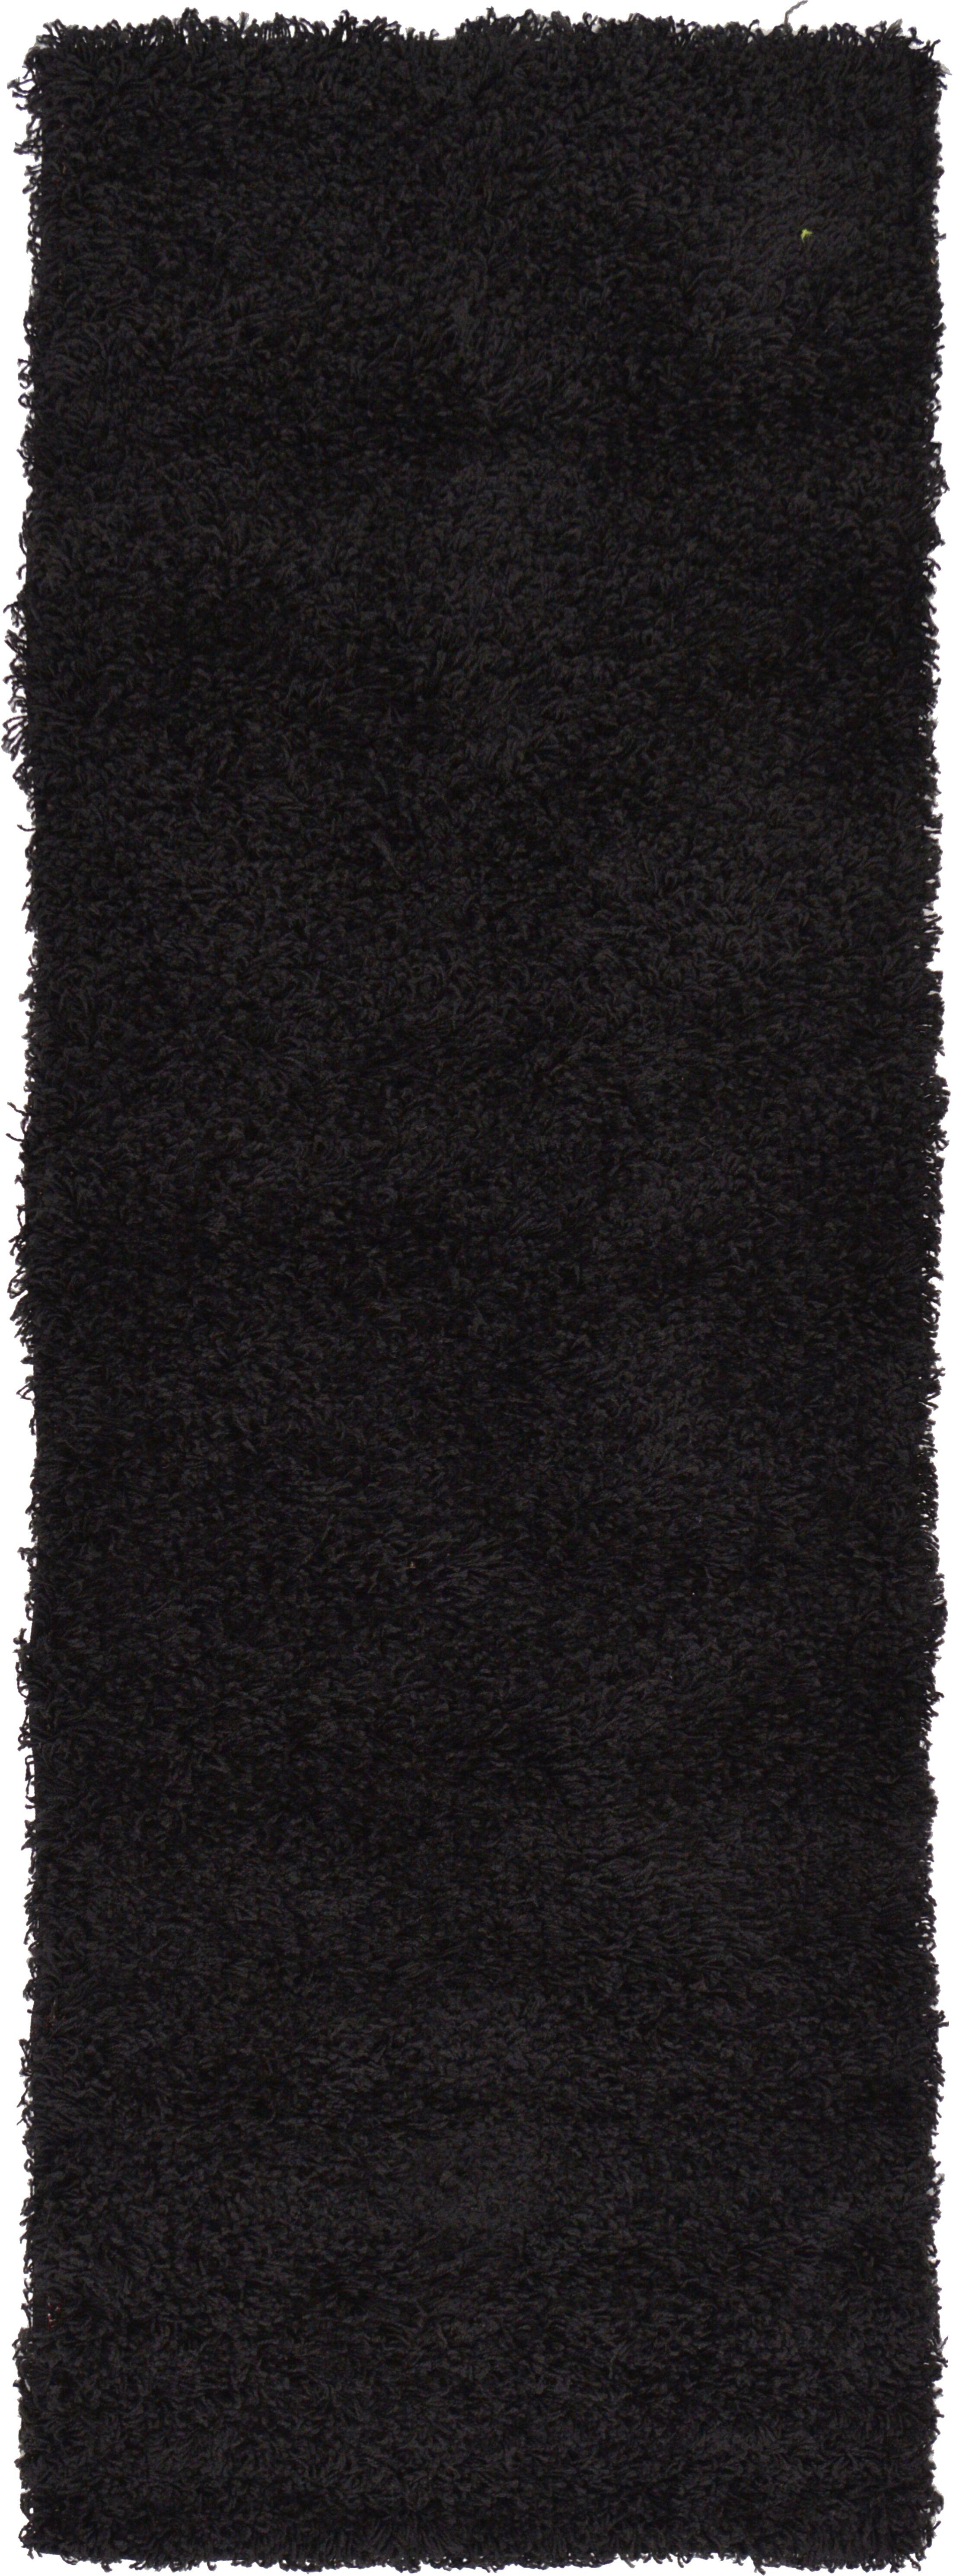 Lilah Black Area Rug Rug Size: Runner 2'6